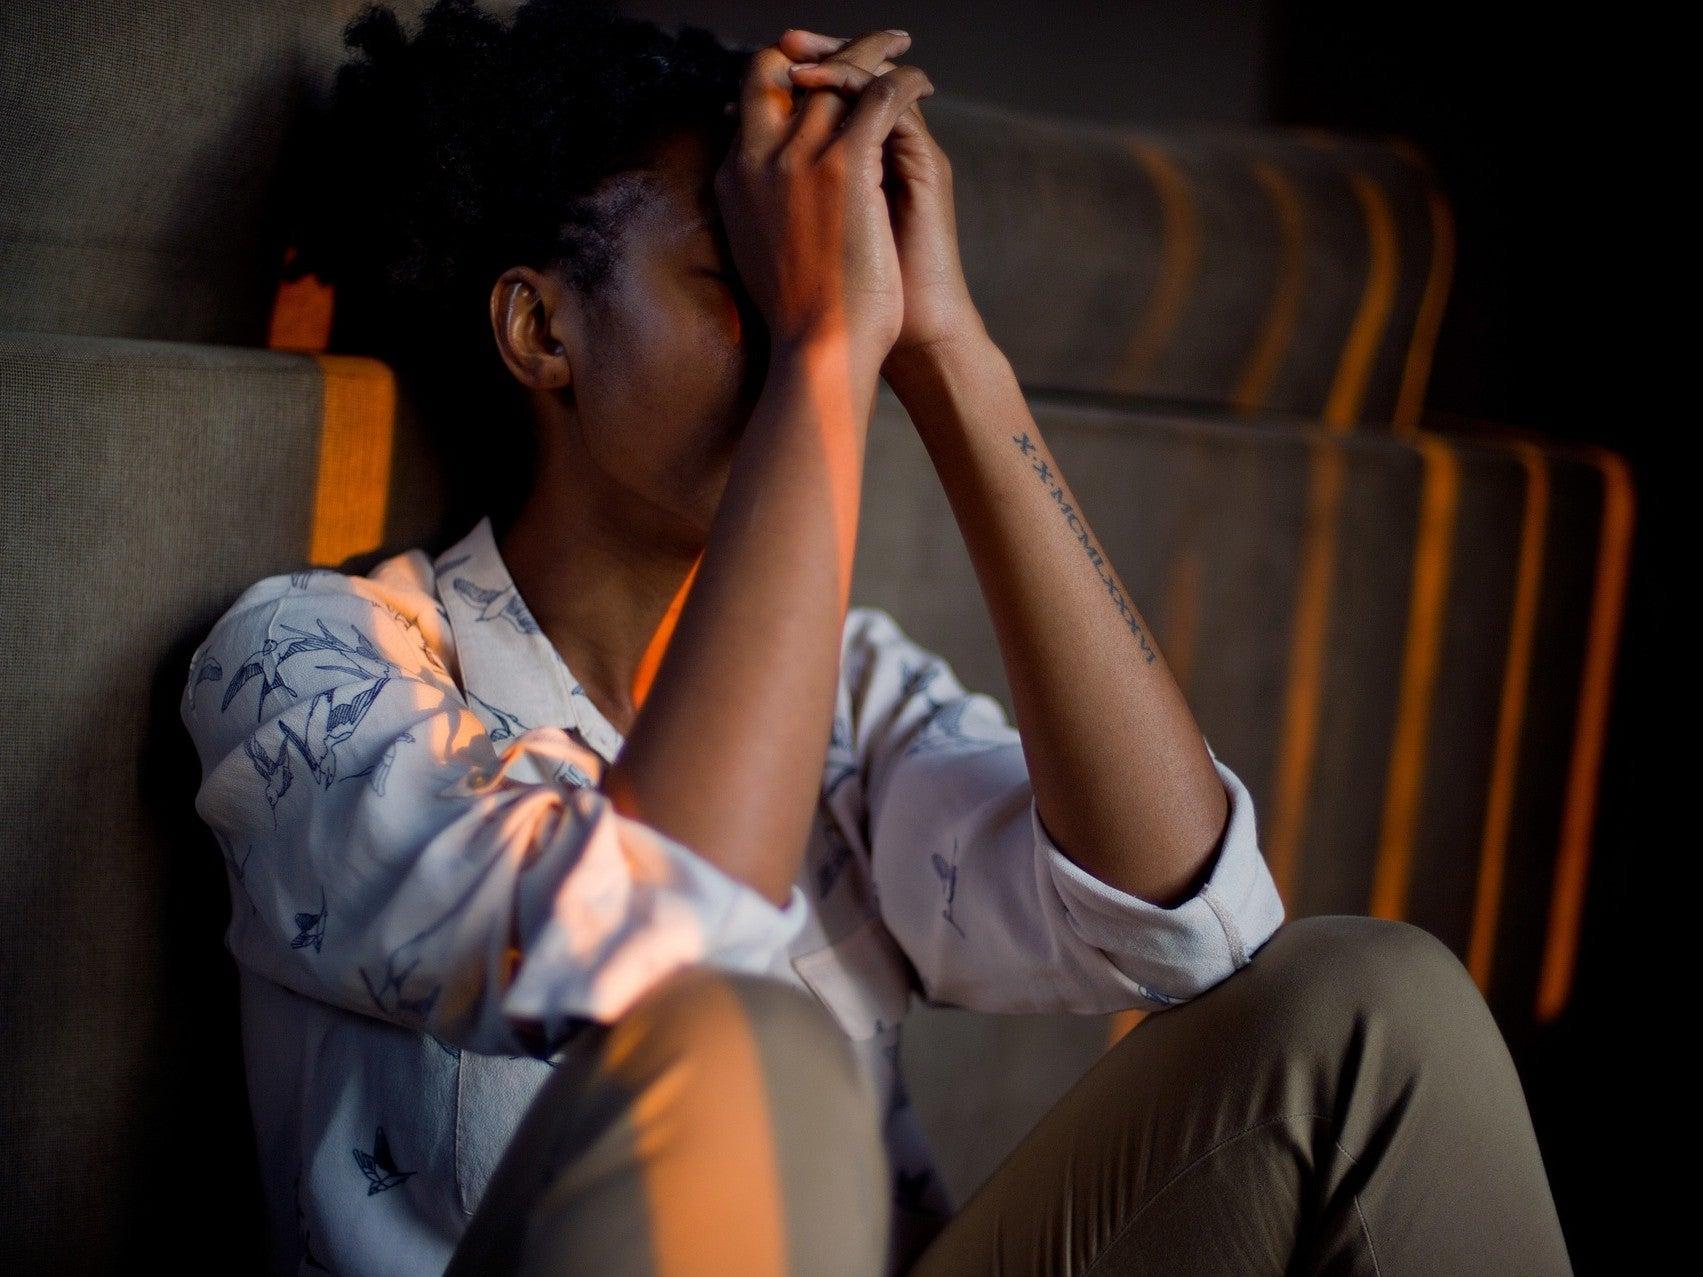 person under stress